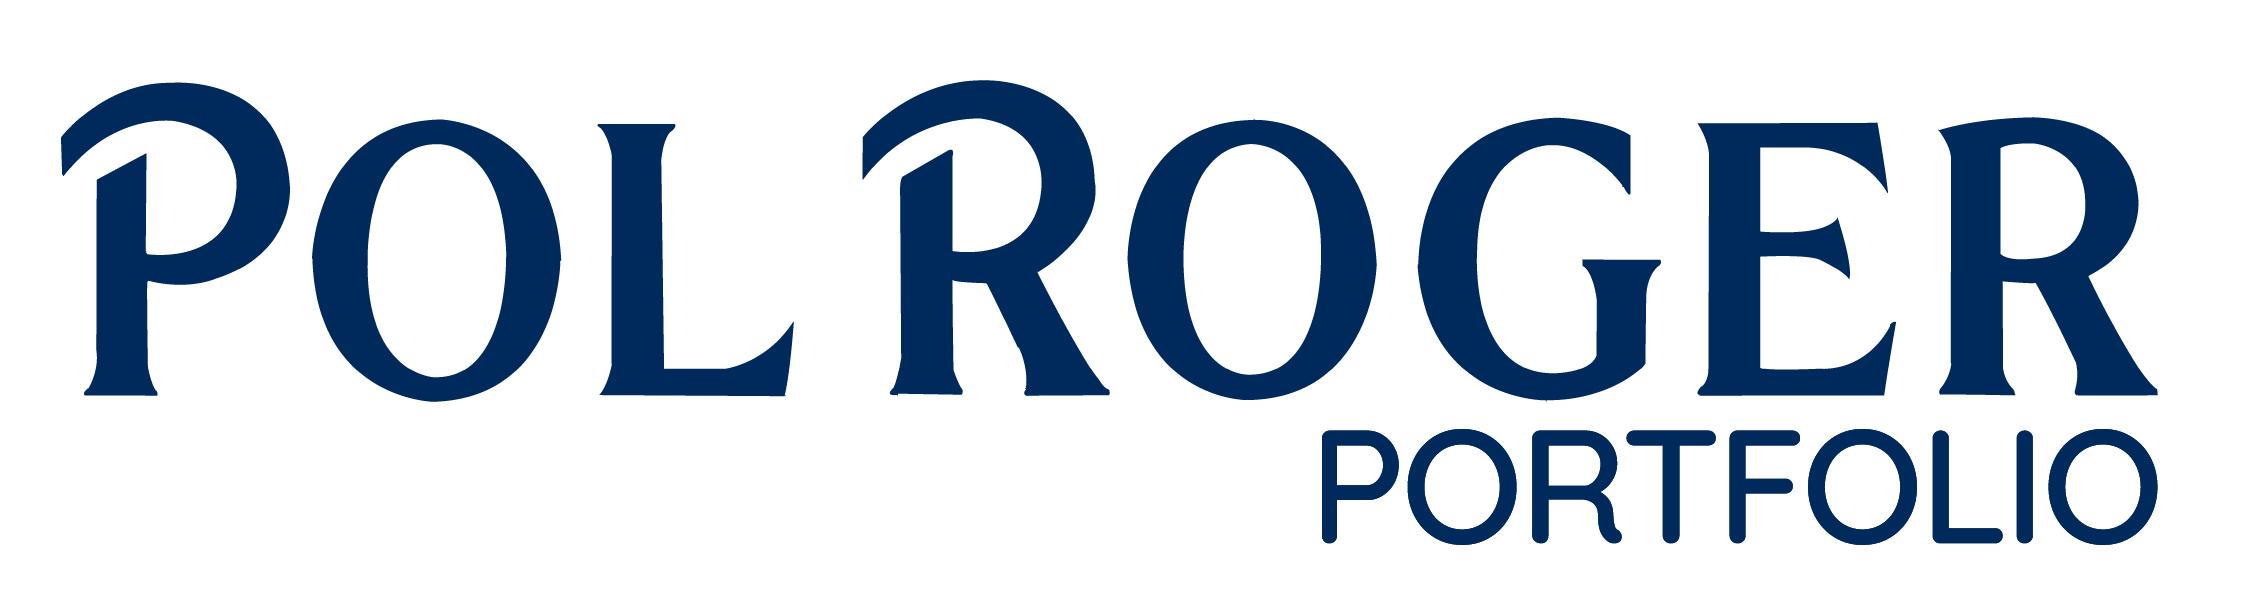 Pol Roger Portfolio